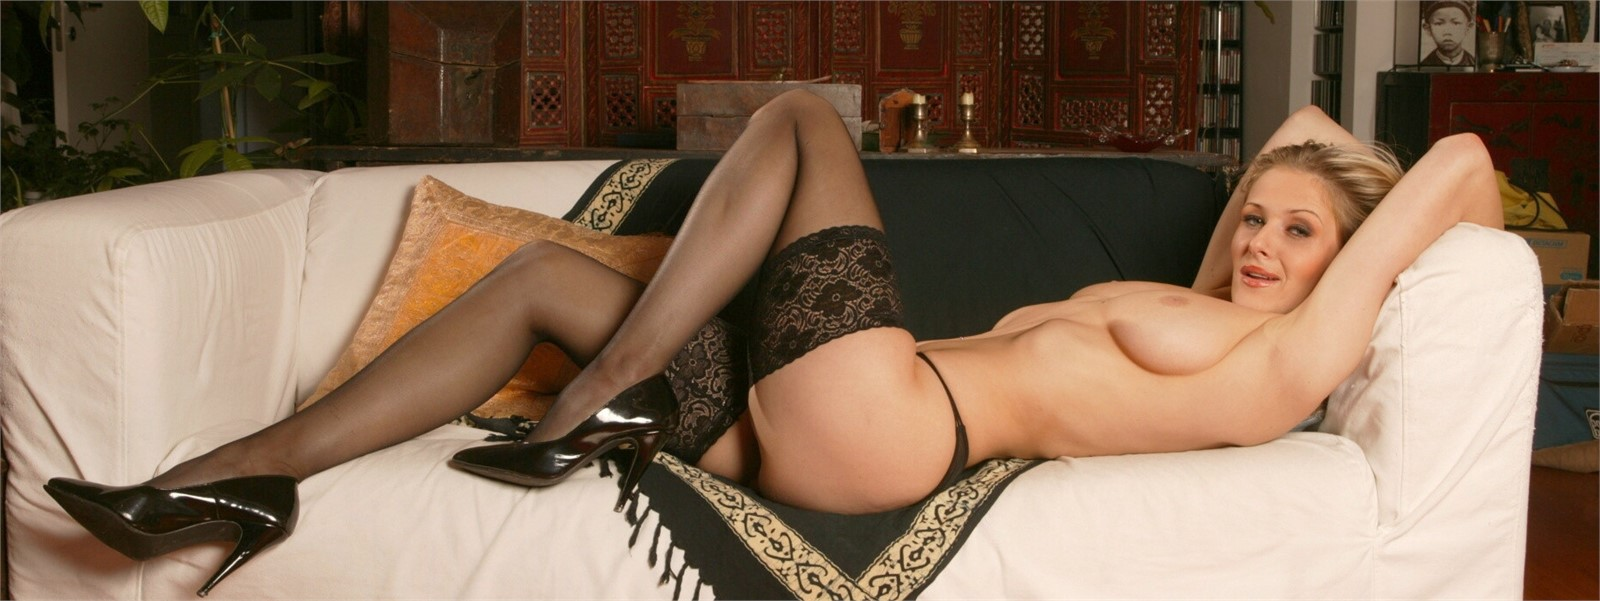 Porn Full HD ass cleavage 3 jane darling megaupload